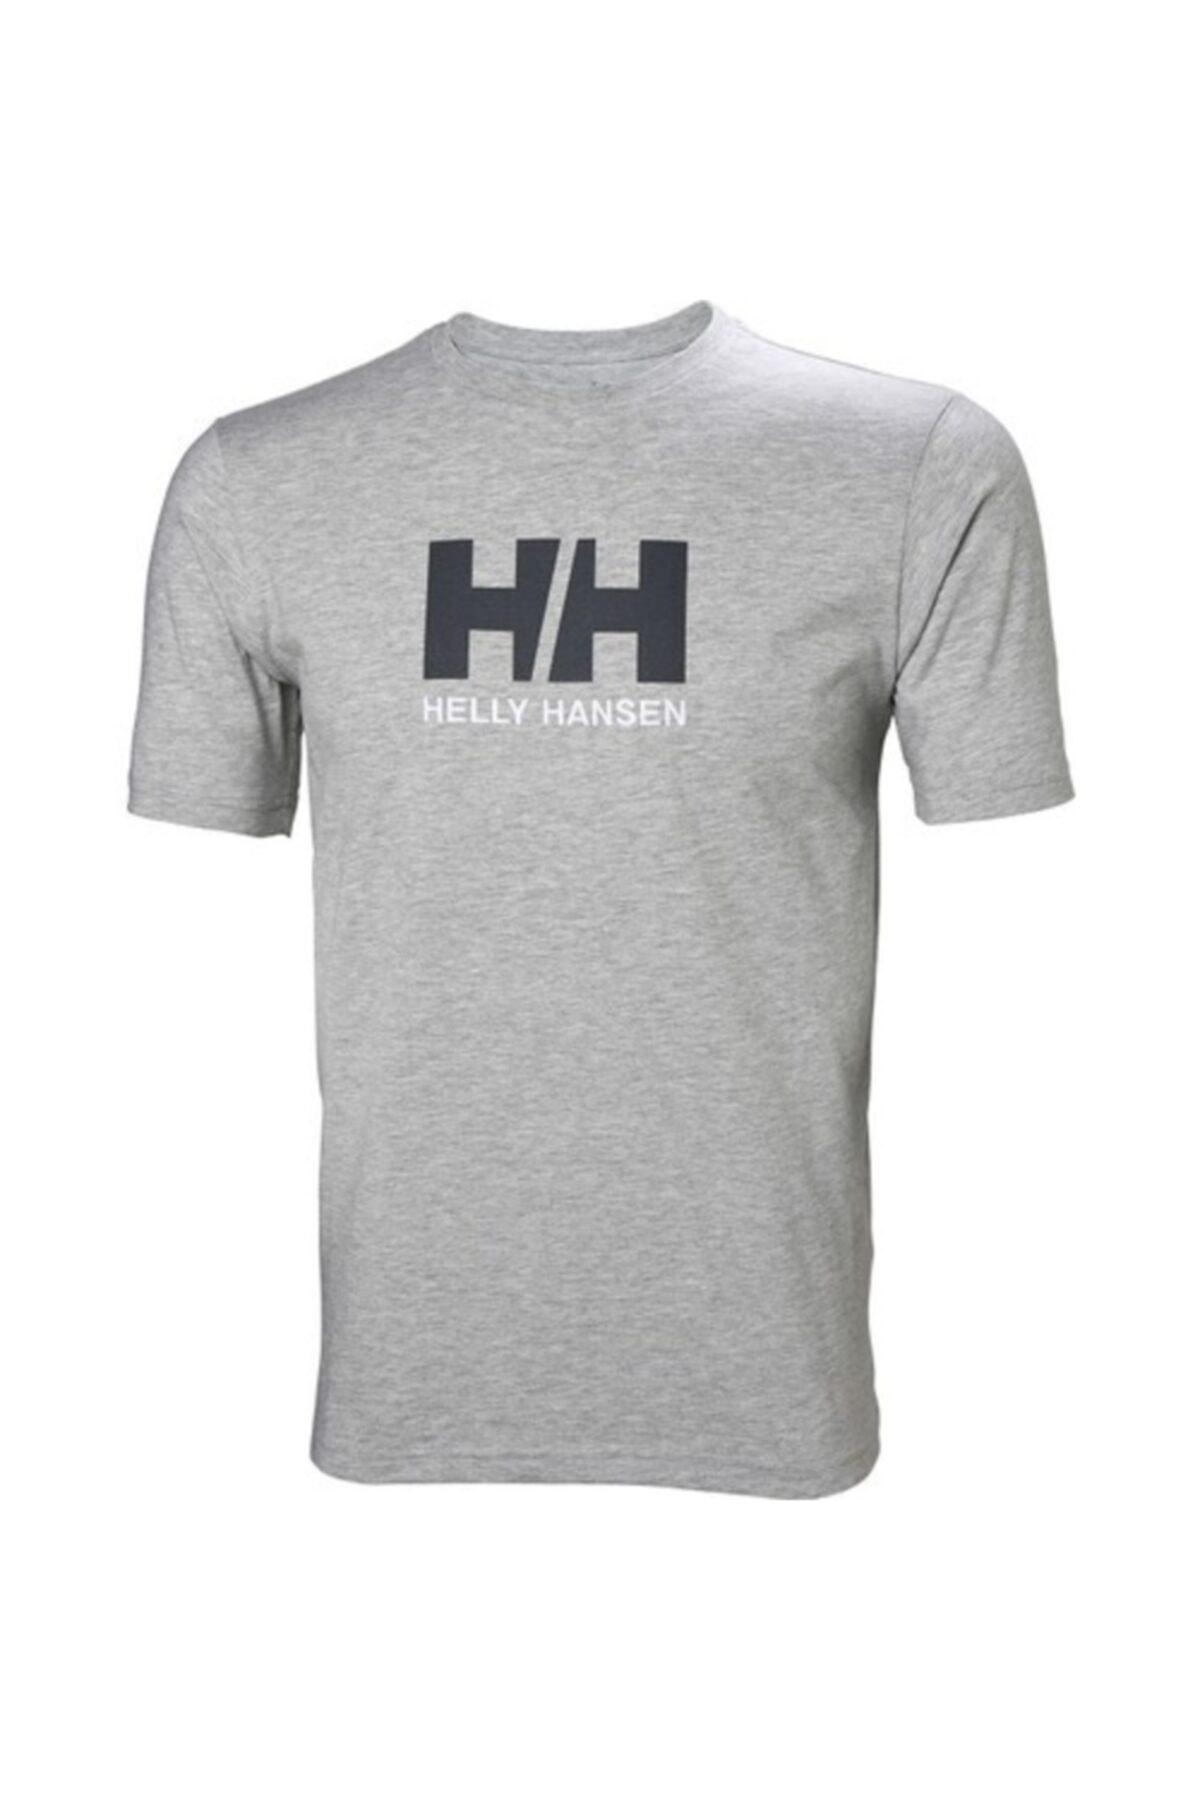 Helly Hansen Hh Logo Erkek T-shirt Gri Melanj 1